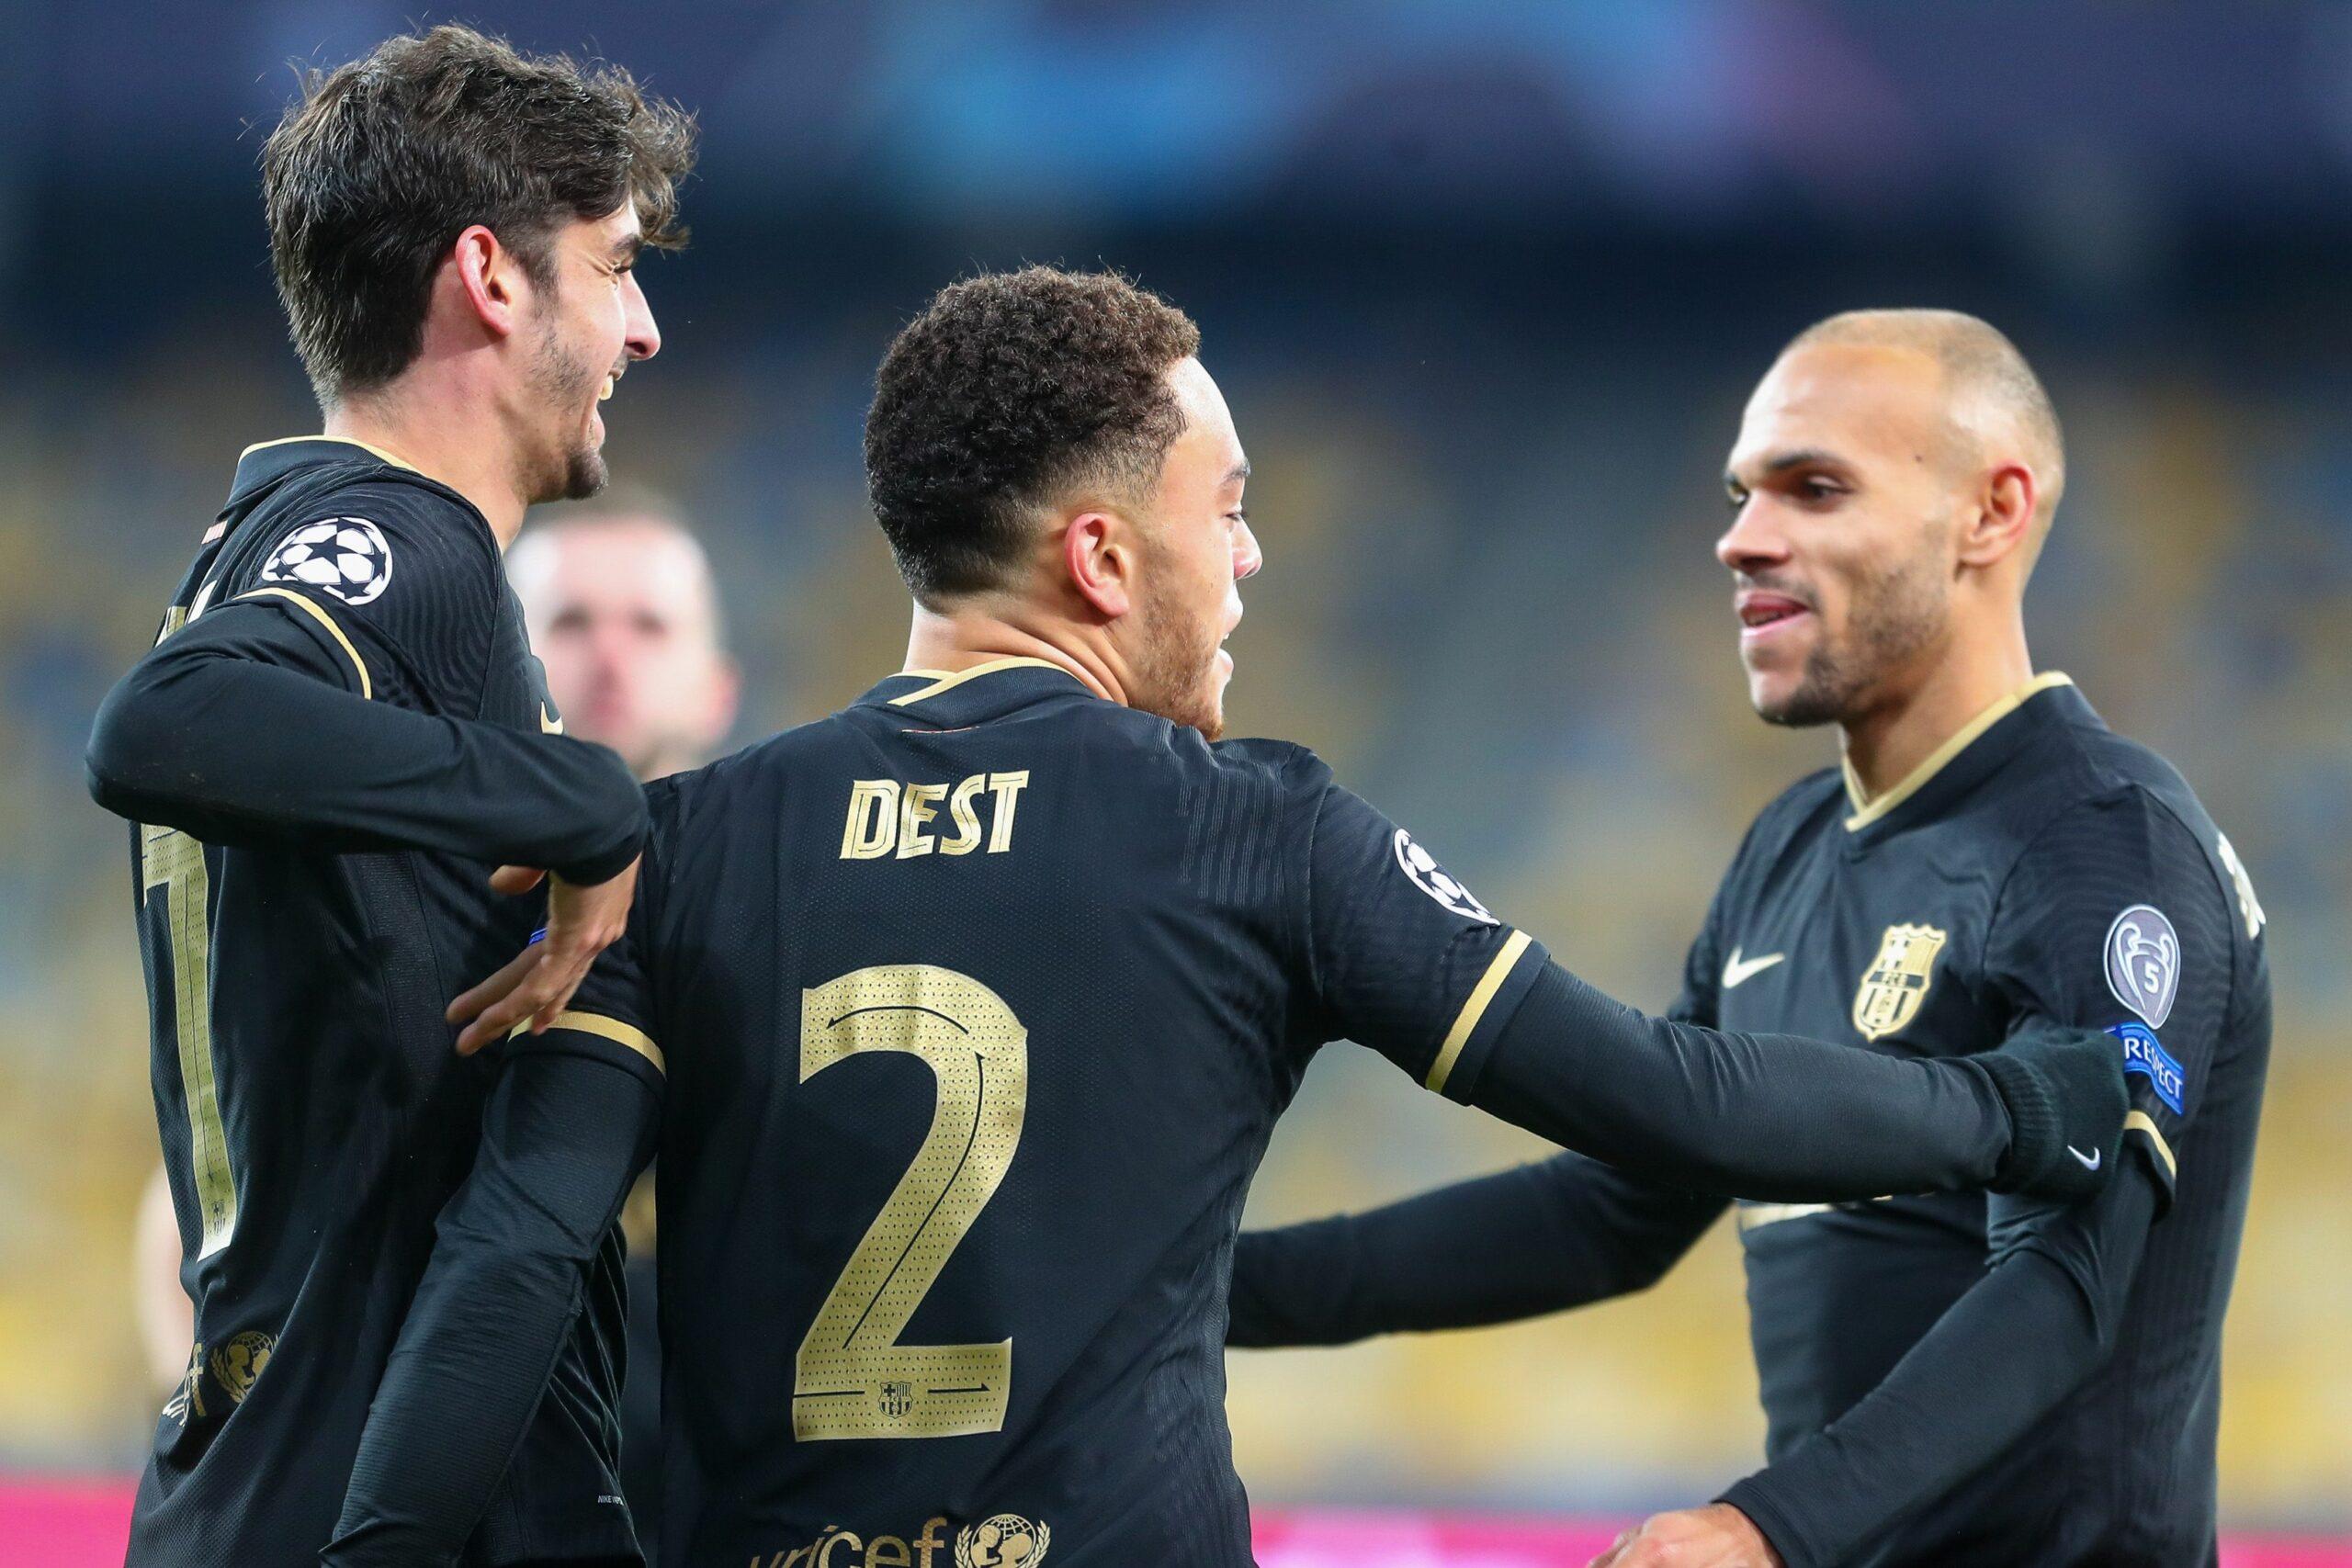 Dest, Trincao i Braithwaite celebren un gol   Europa Press